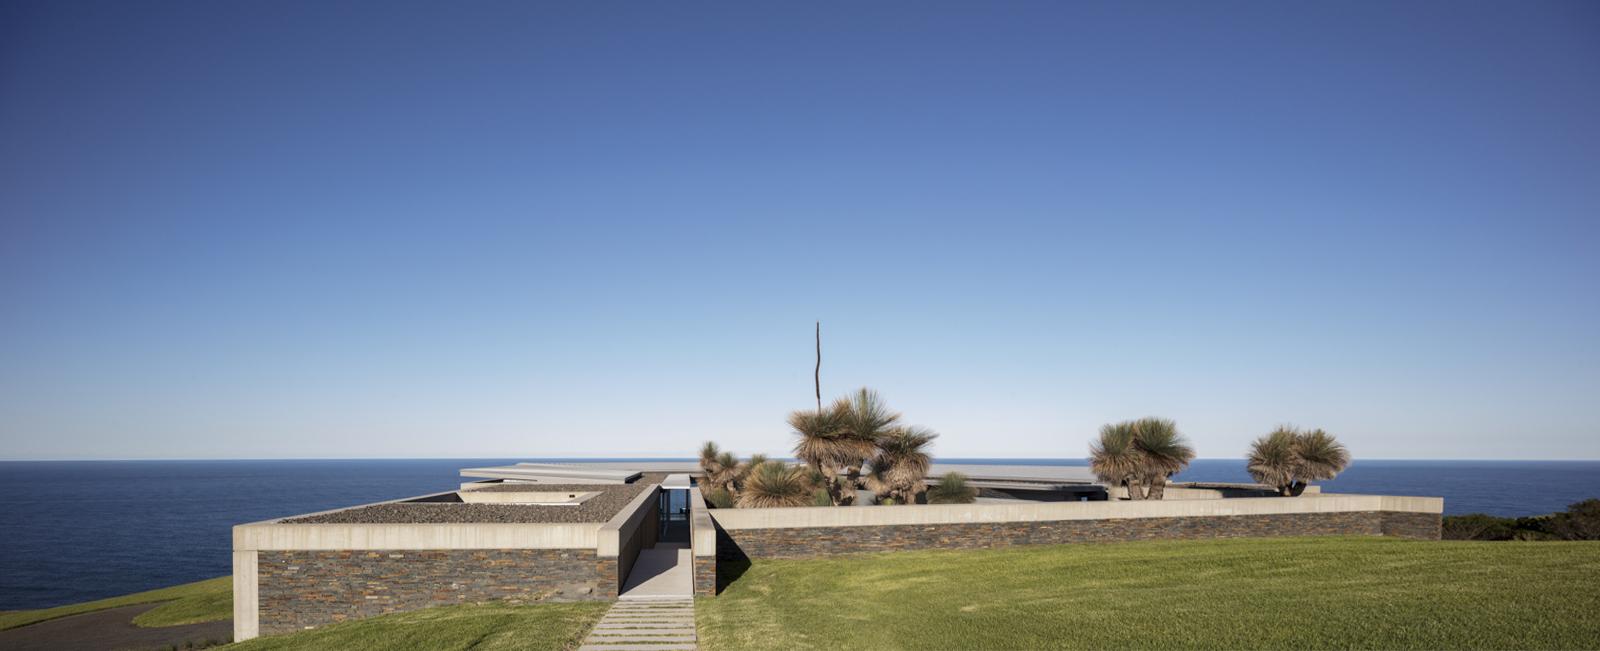 The Horizon House By Hills Thalis Local Australian Architecture & Contemporary Design Nsw, Australia Image 12